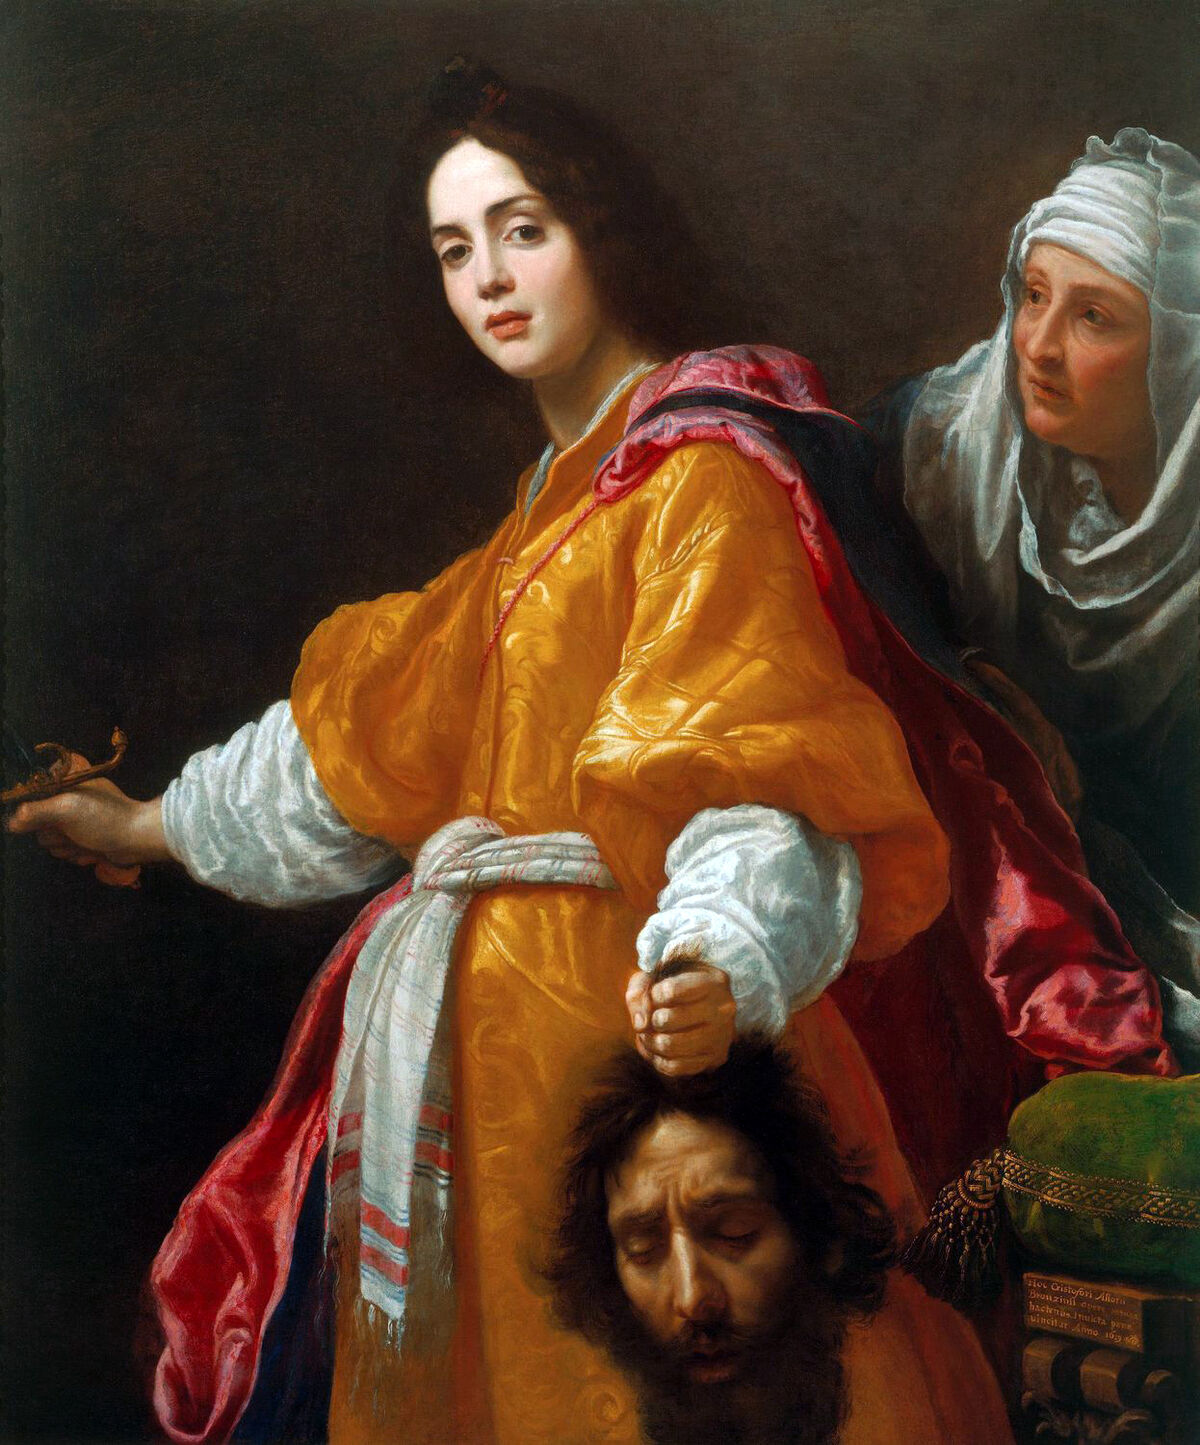 Cristofano Allori, Judith with the Head of Holophernes, 1613. Image via Wikimedia Commons.